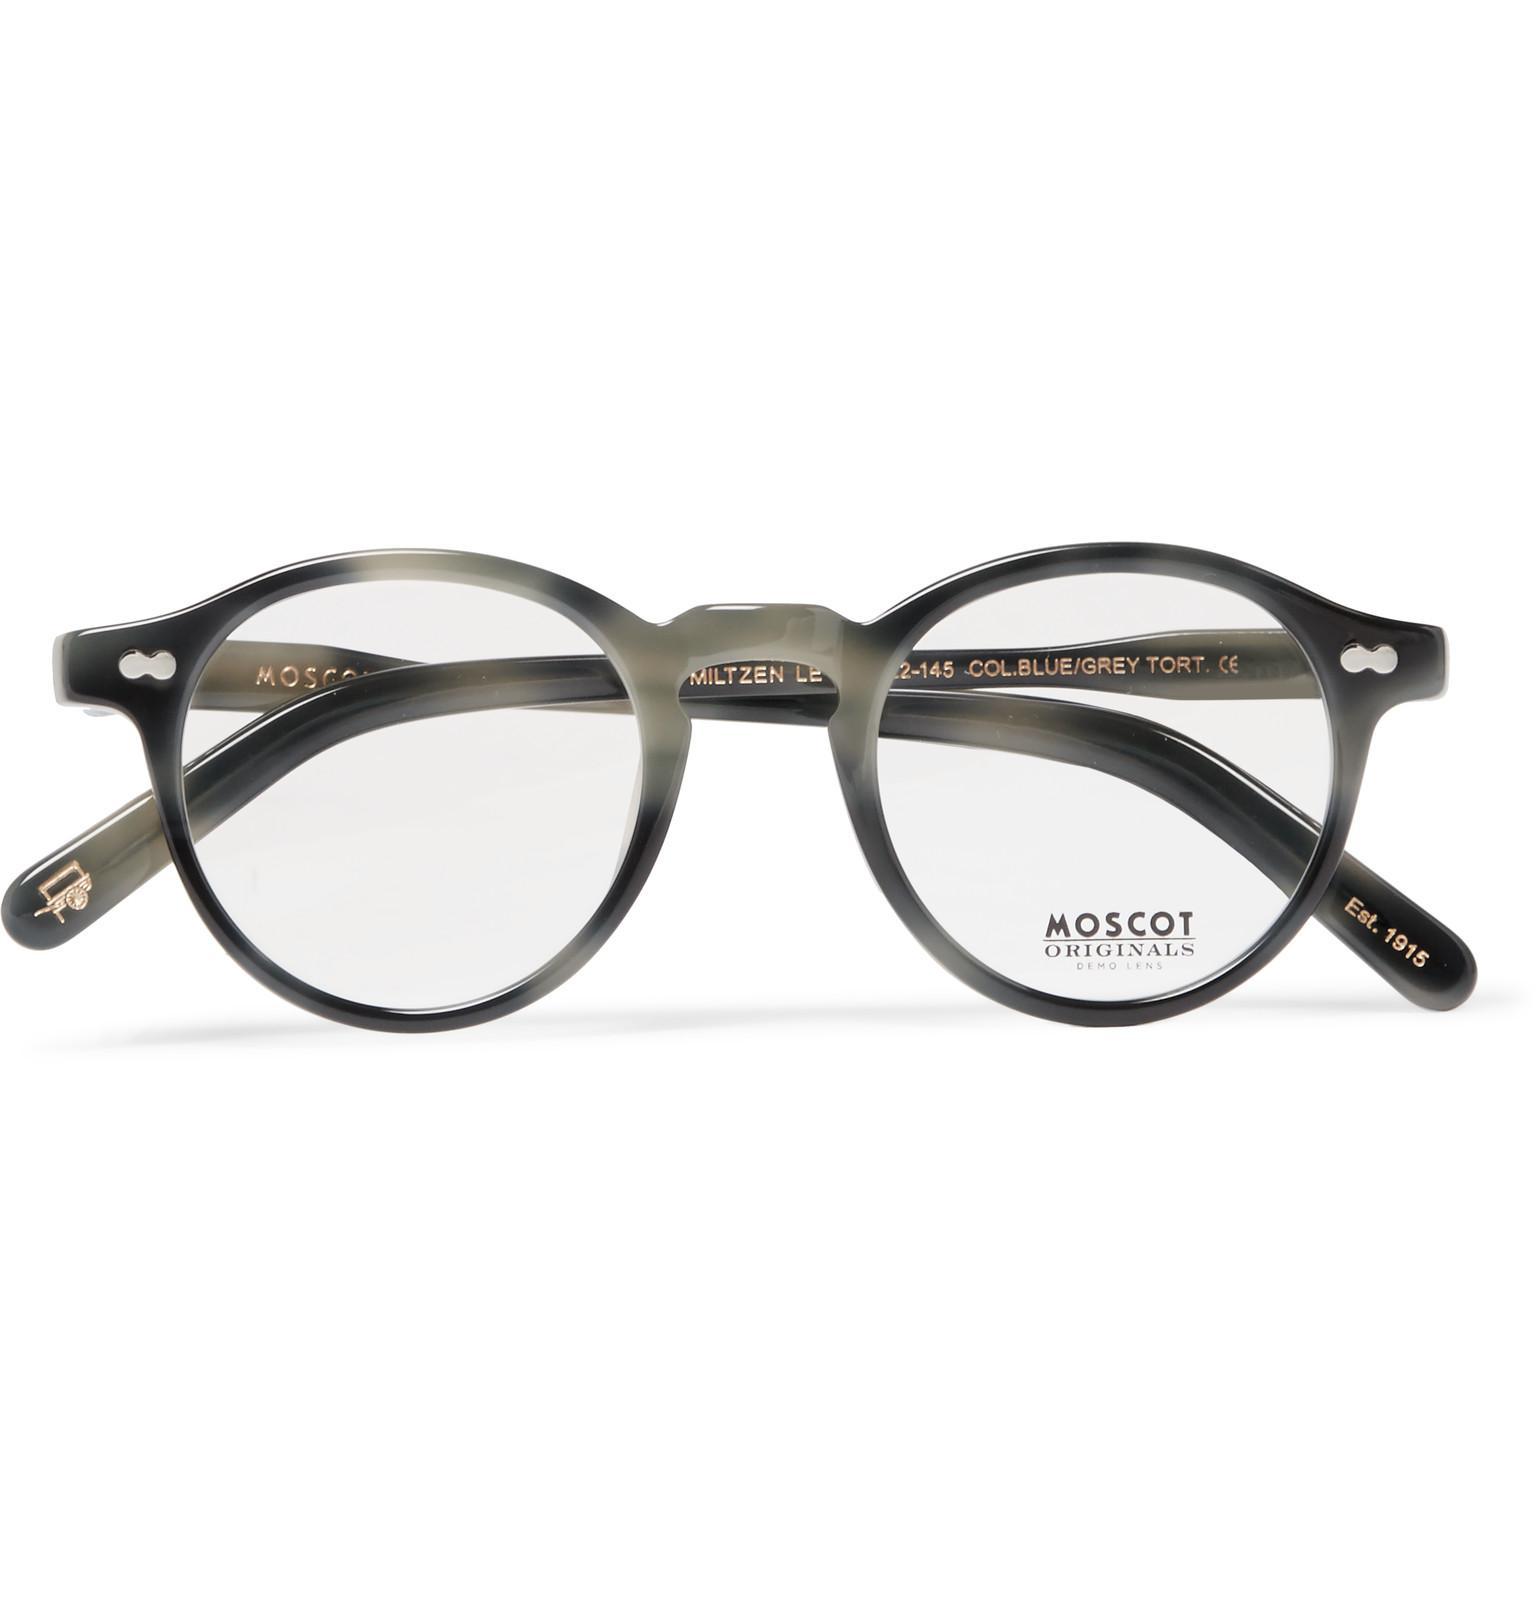 a1d72f830b2 Lyst - Moscot Miltzen Round-frame Acetate Optical Glasses in Gray ...